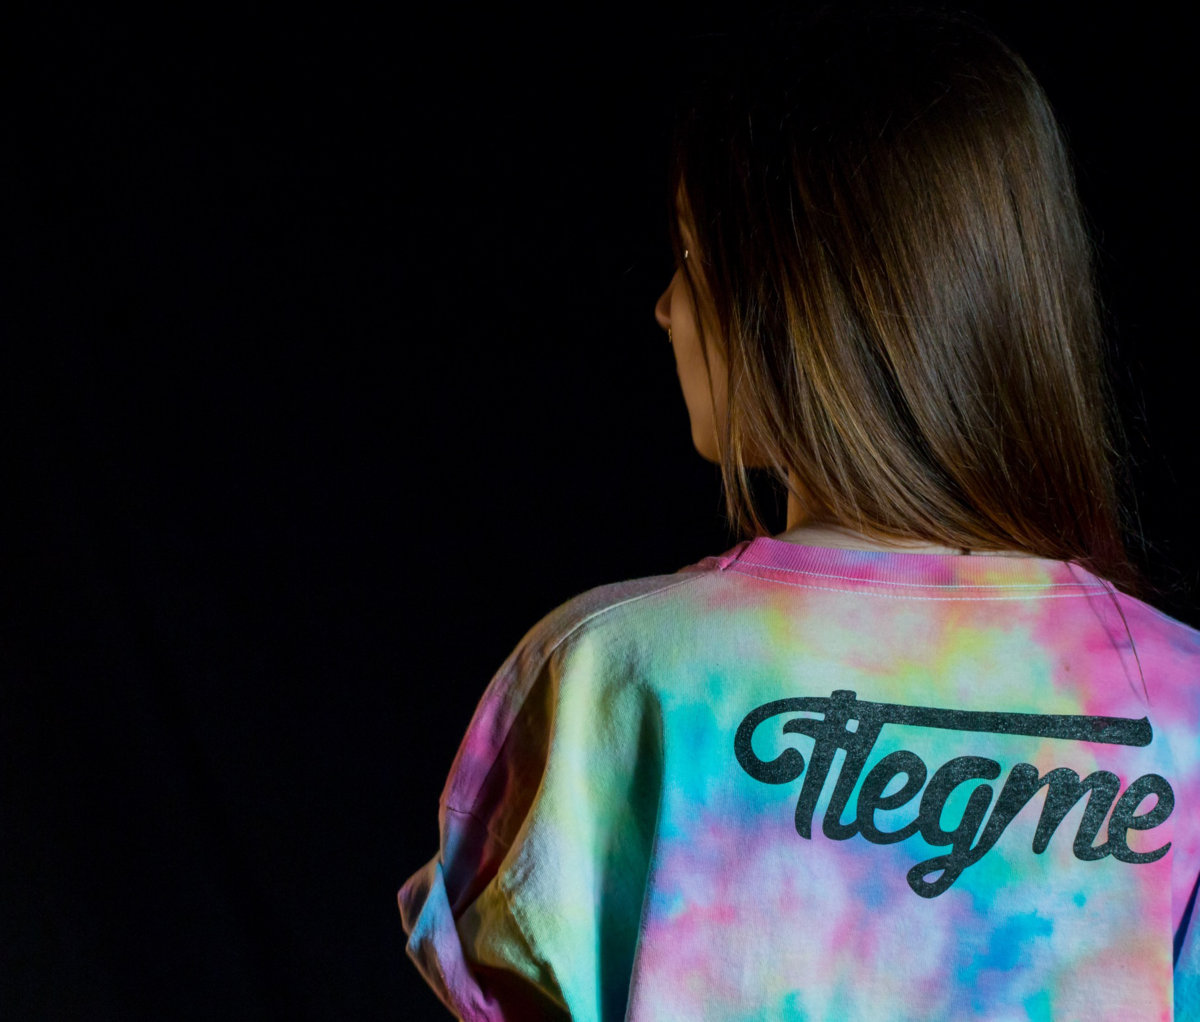 Tee-shirt de Carton-Pâte Records x Flegme